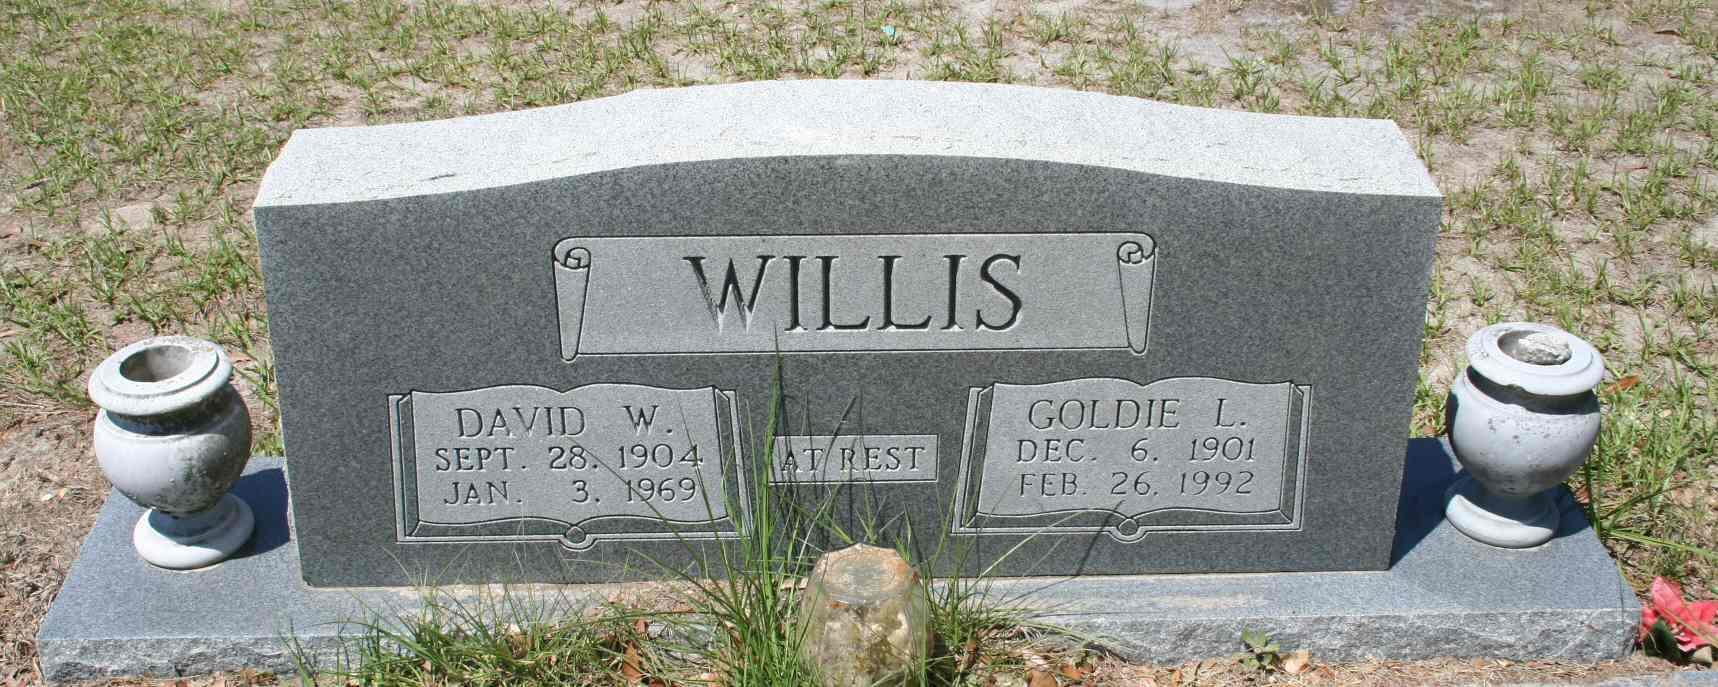 David Washington Willis